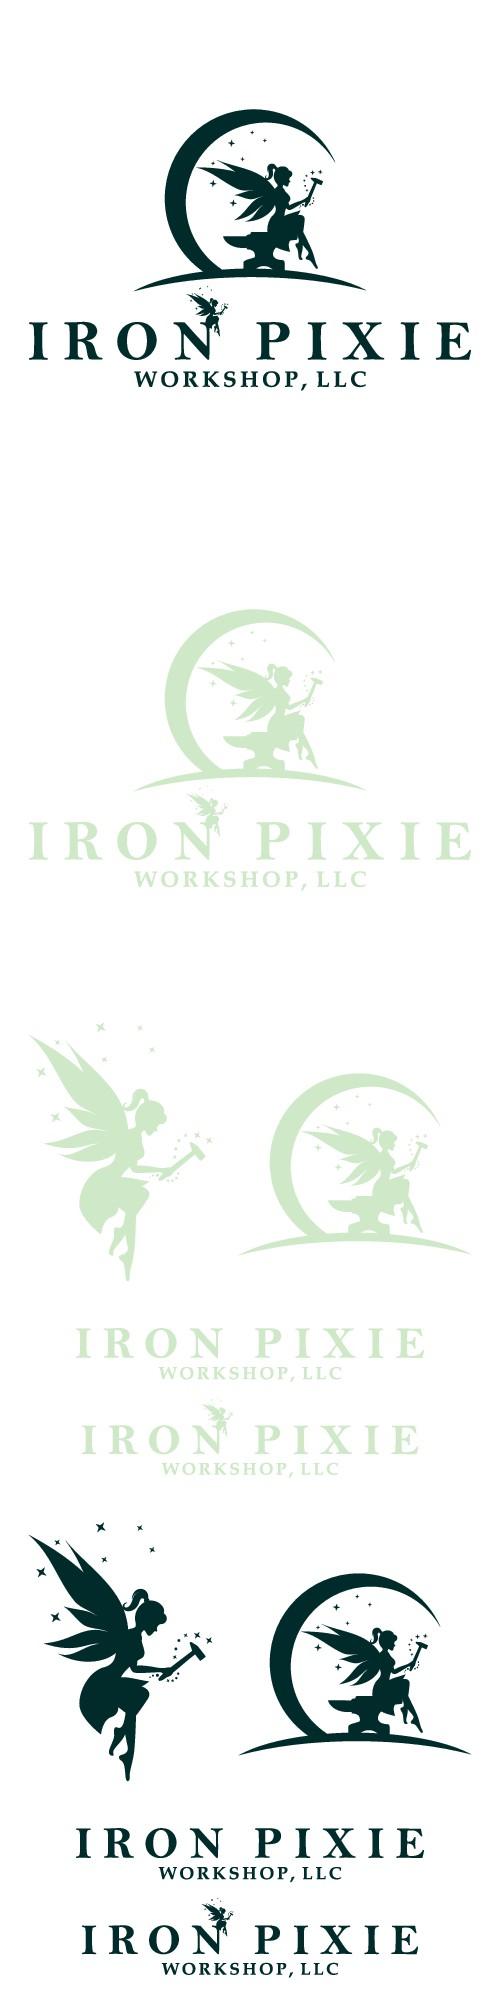 Iron Pixie Workshop, LLC needs a great artist.